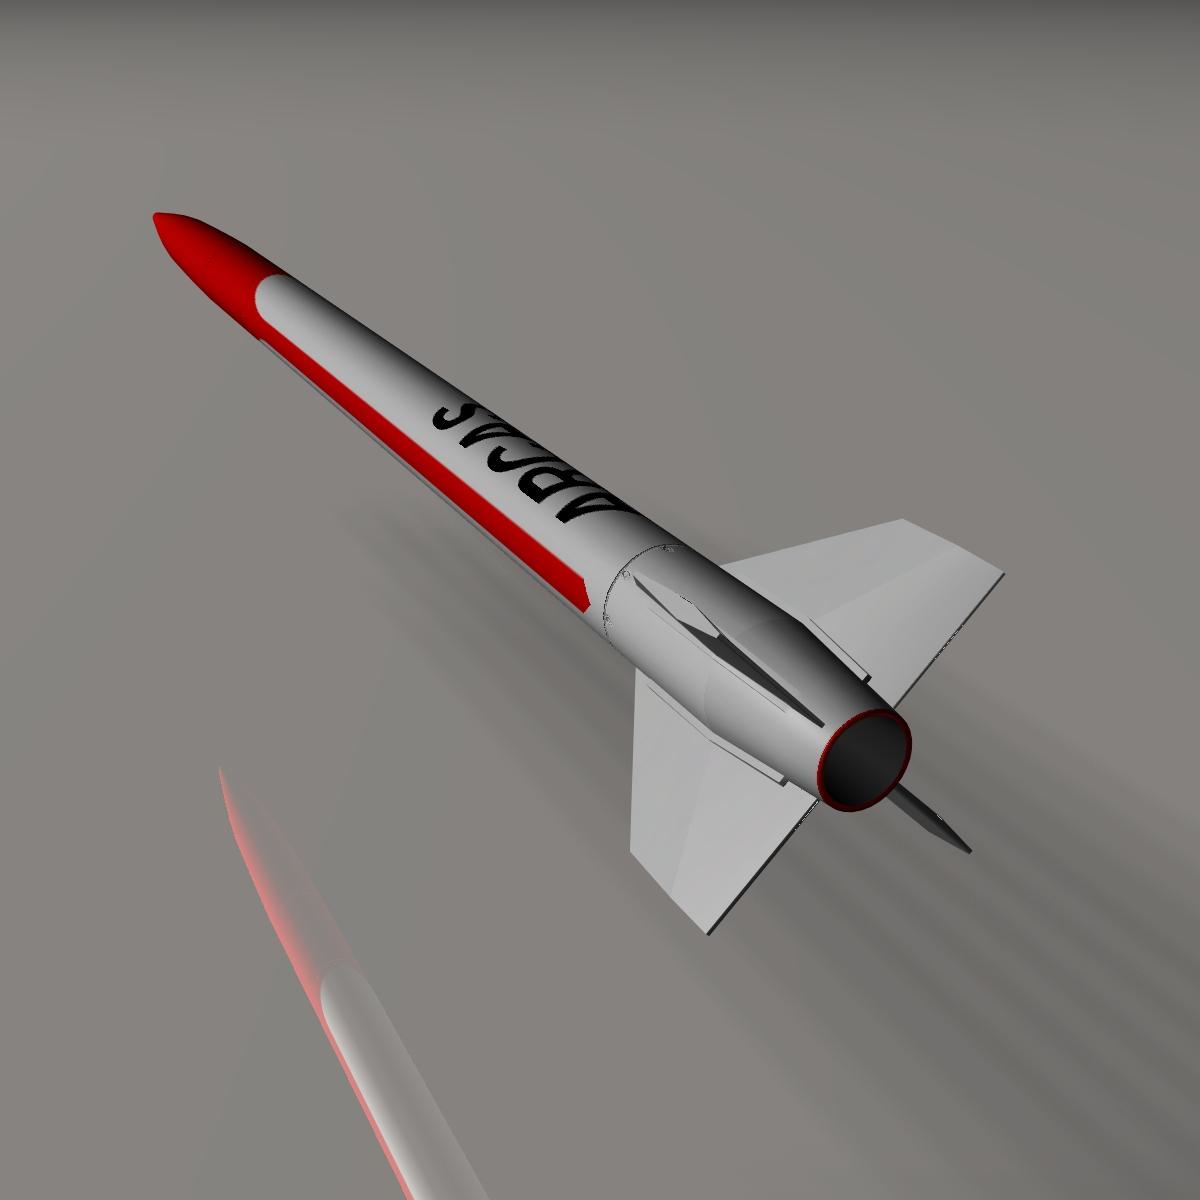 us пуужин 3d загвар 3ds dxf cob x obj 155406 сонсогдож байна